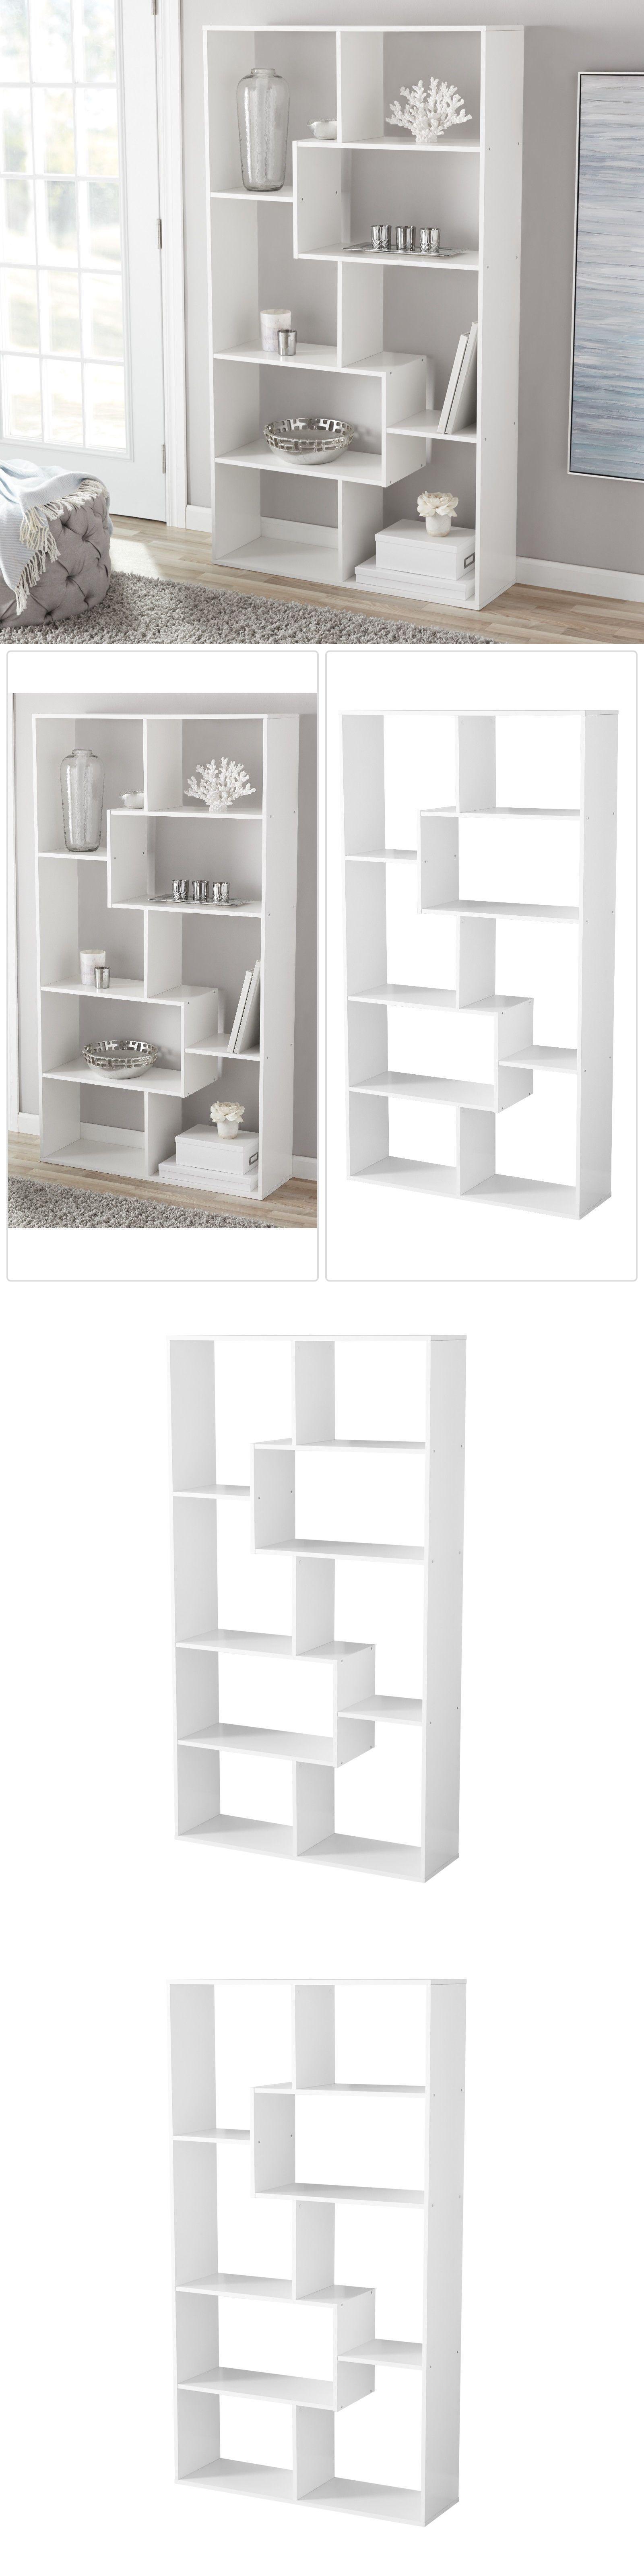 Bookcases 3199 Tall Bookcase Storage Cube Open Bookshelf Modern 8